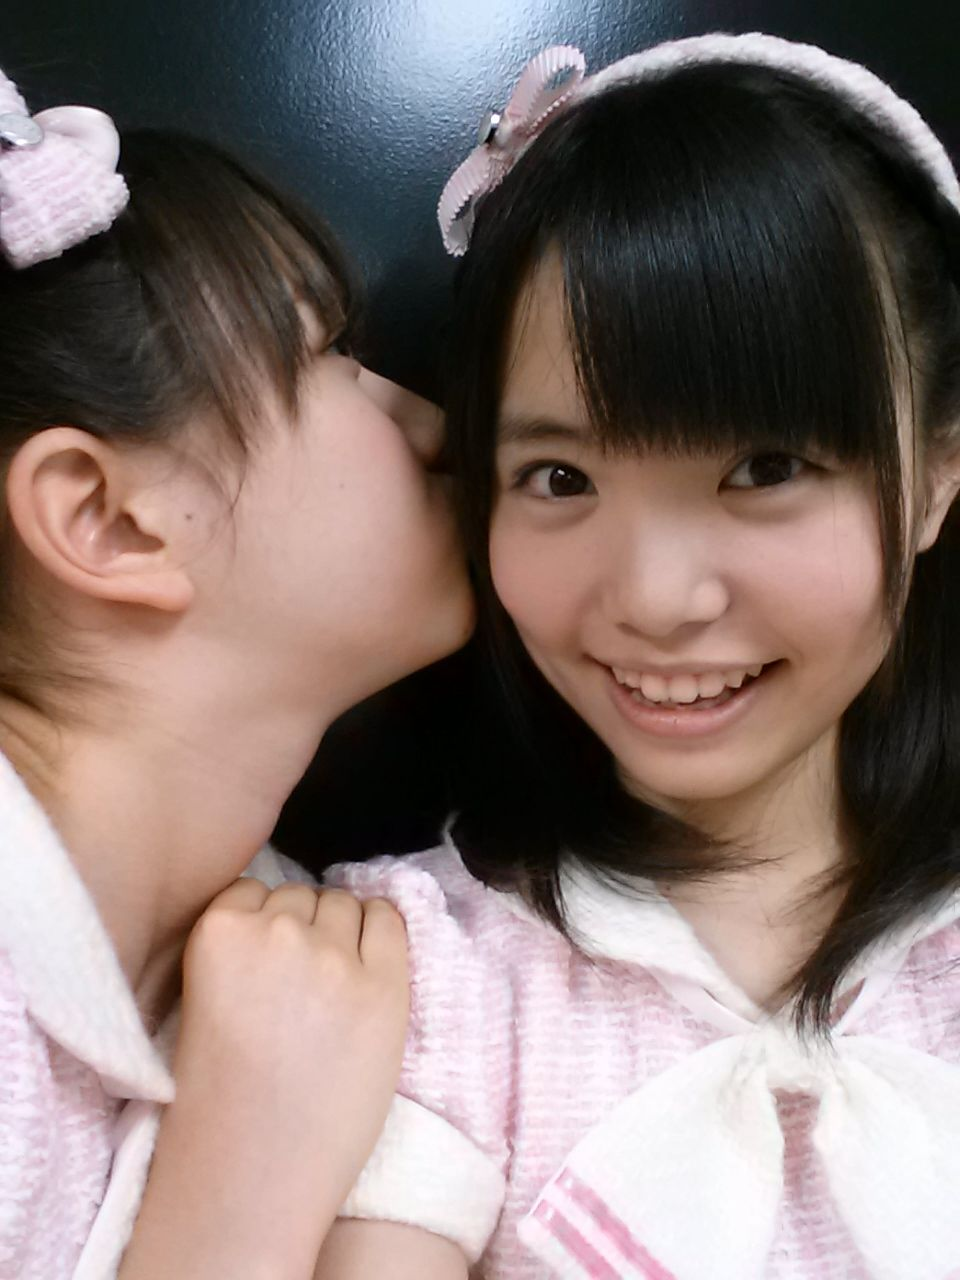 http://livedoor.blogimg.jp/otohaeika/imgs/f/6/f679ce41.jpg